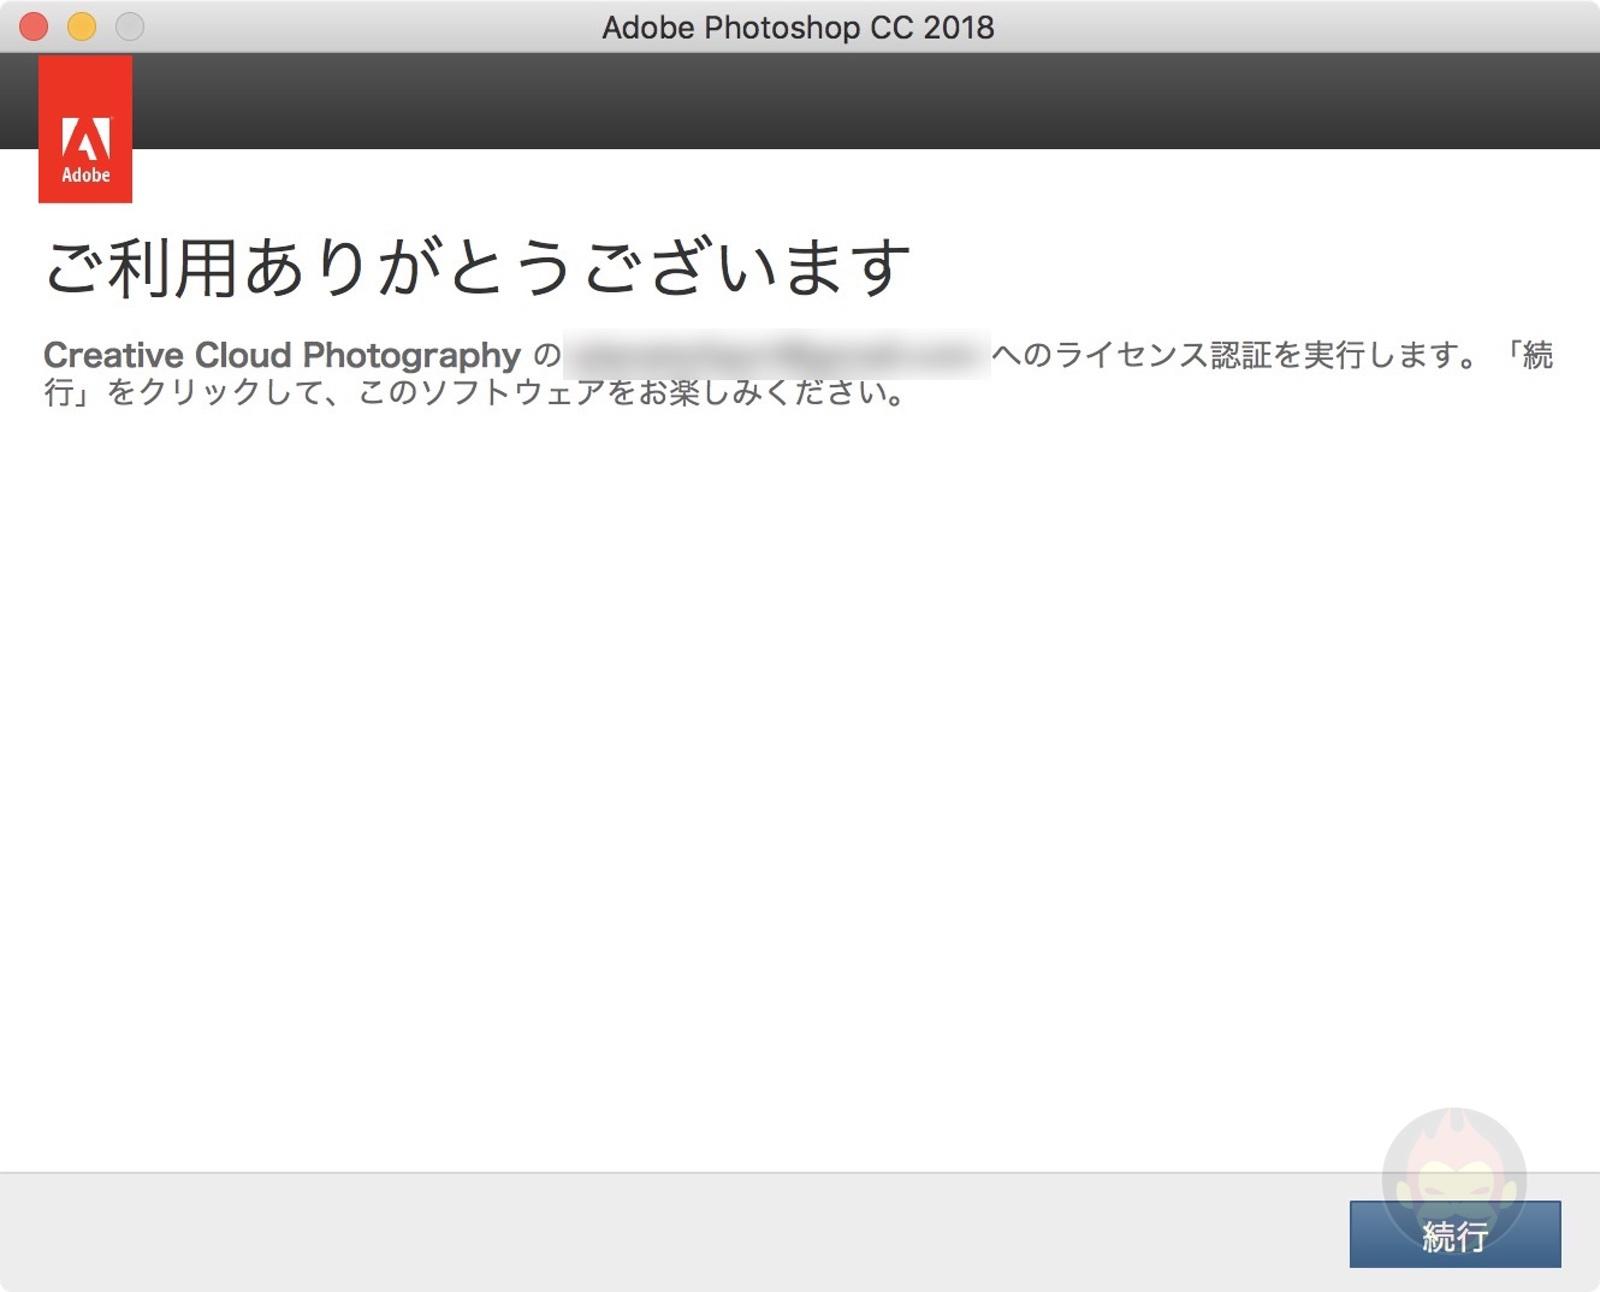 Authenticating-adobe-cc-on-new-mac-03.jpg